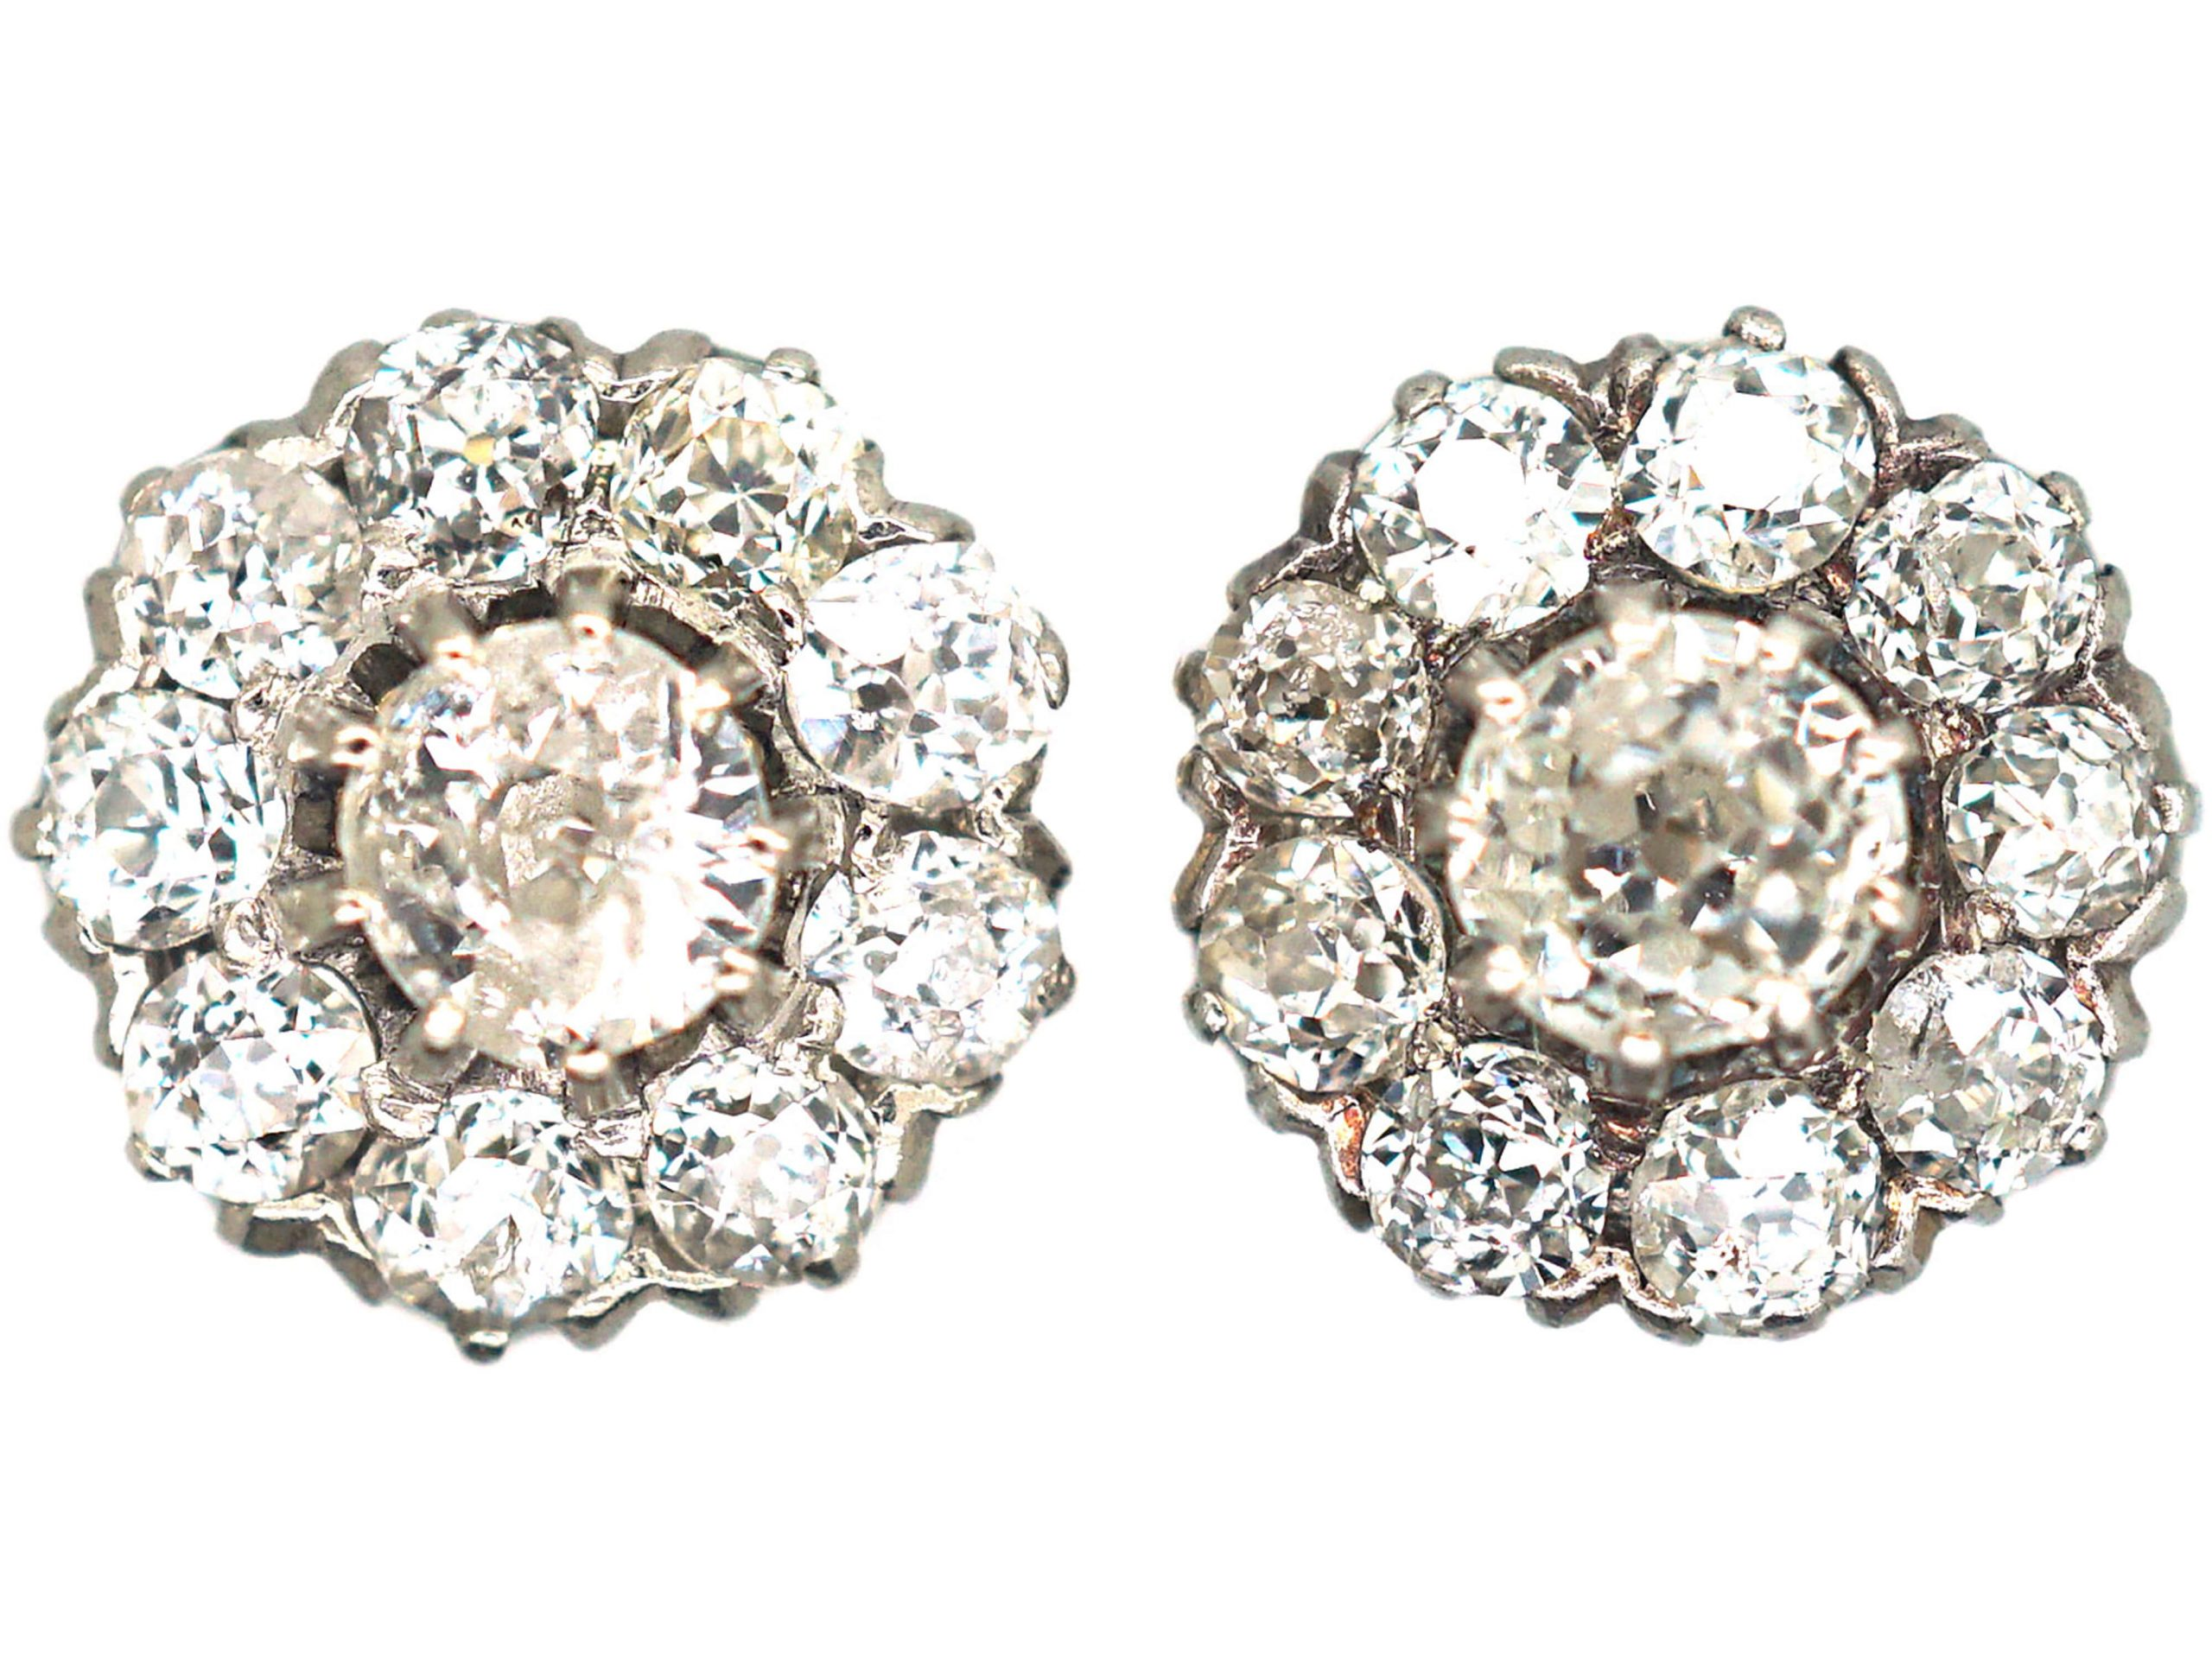 Edwardian 18ct Gold & Platinum, Diamond Daisy Cluster Earrings